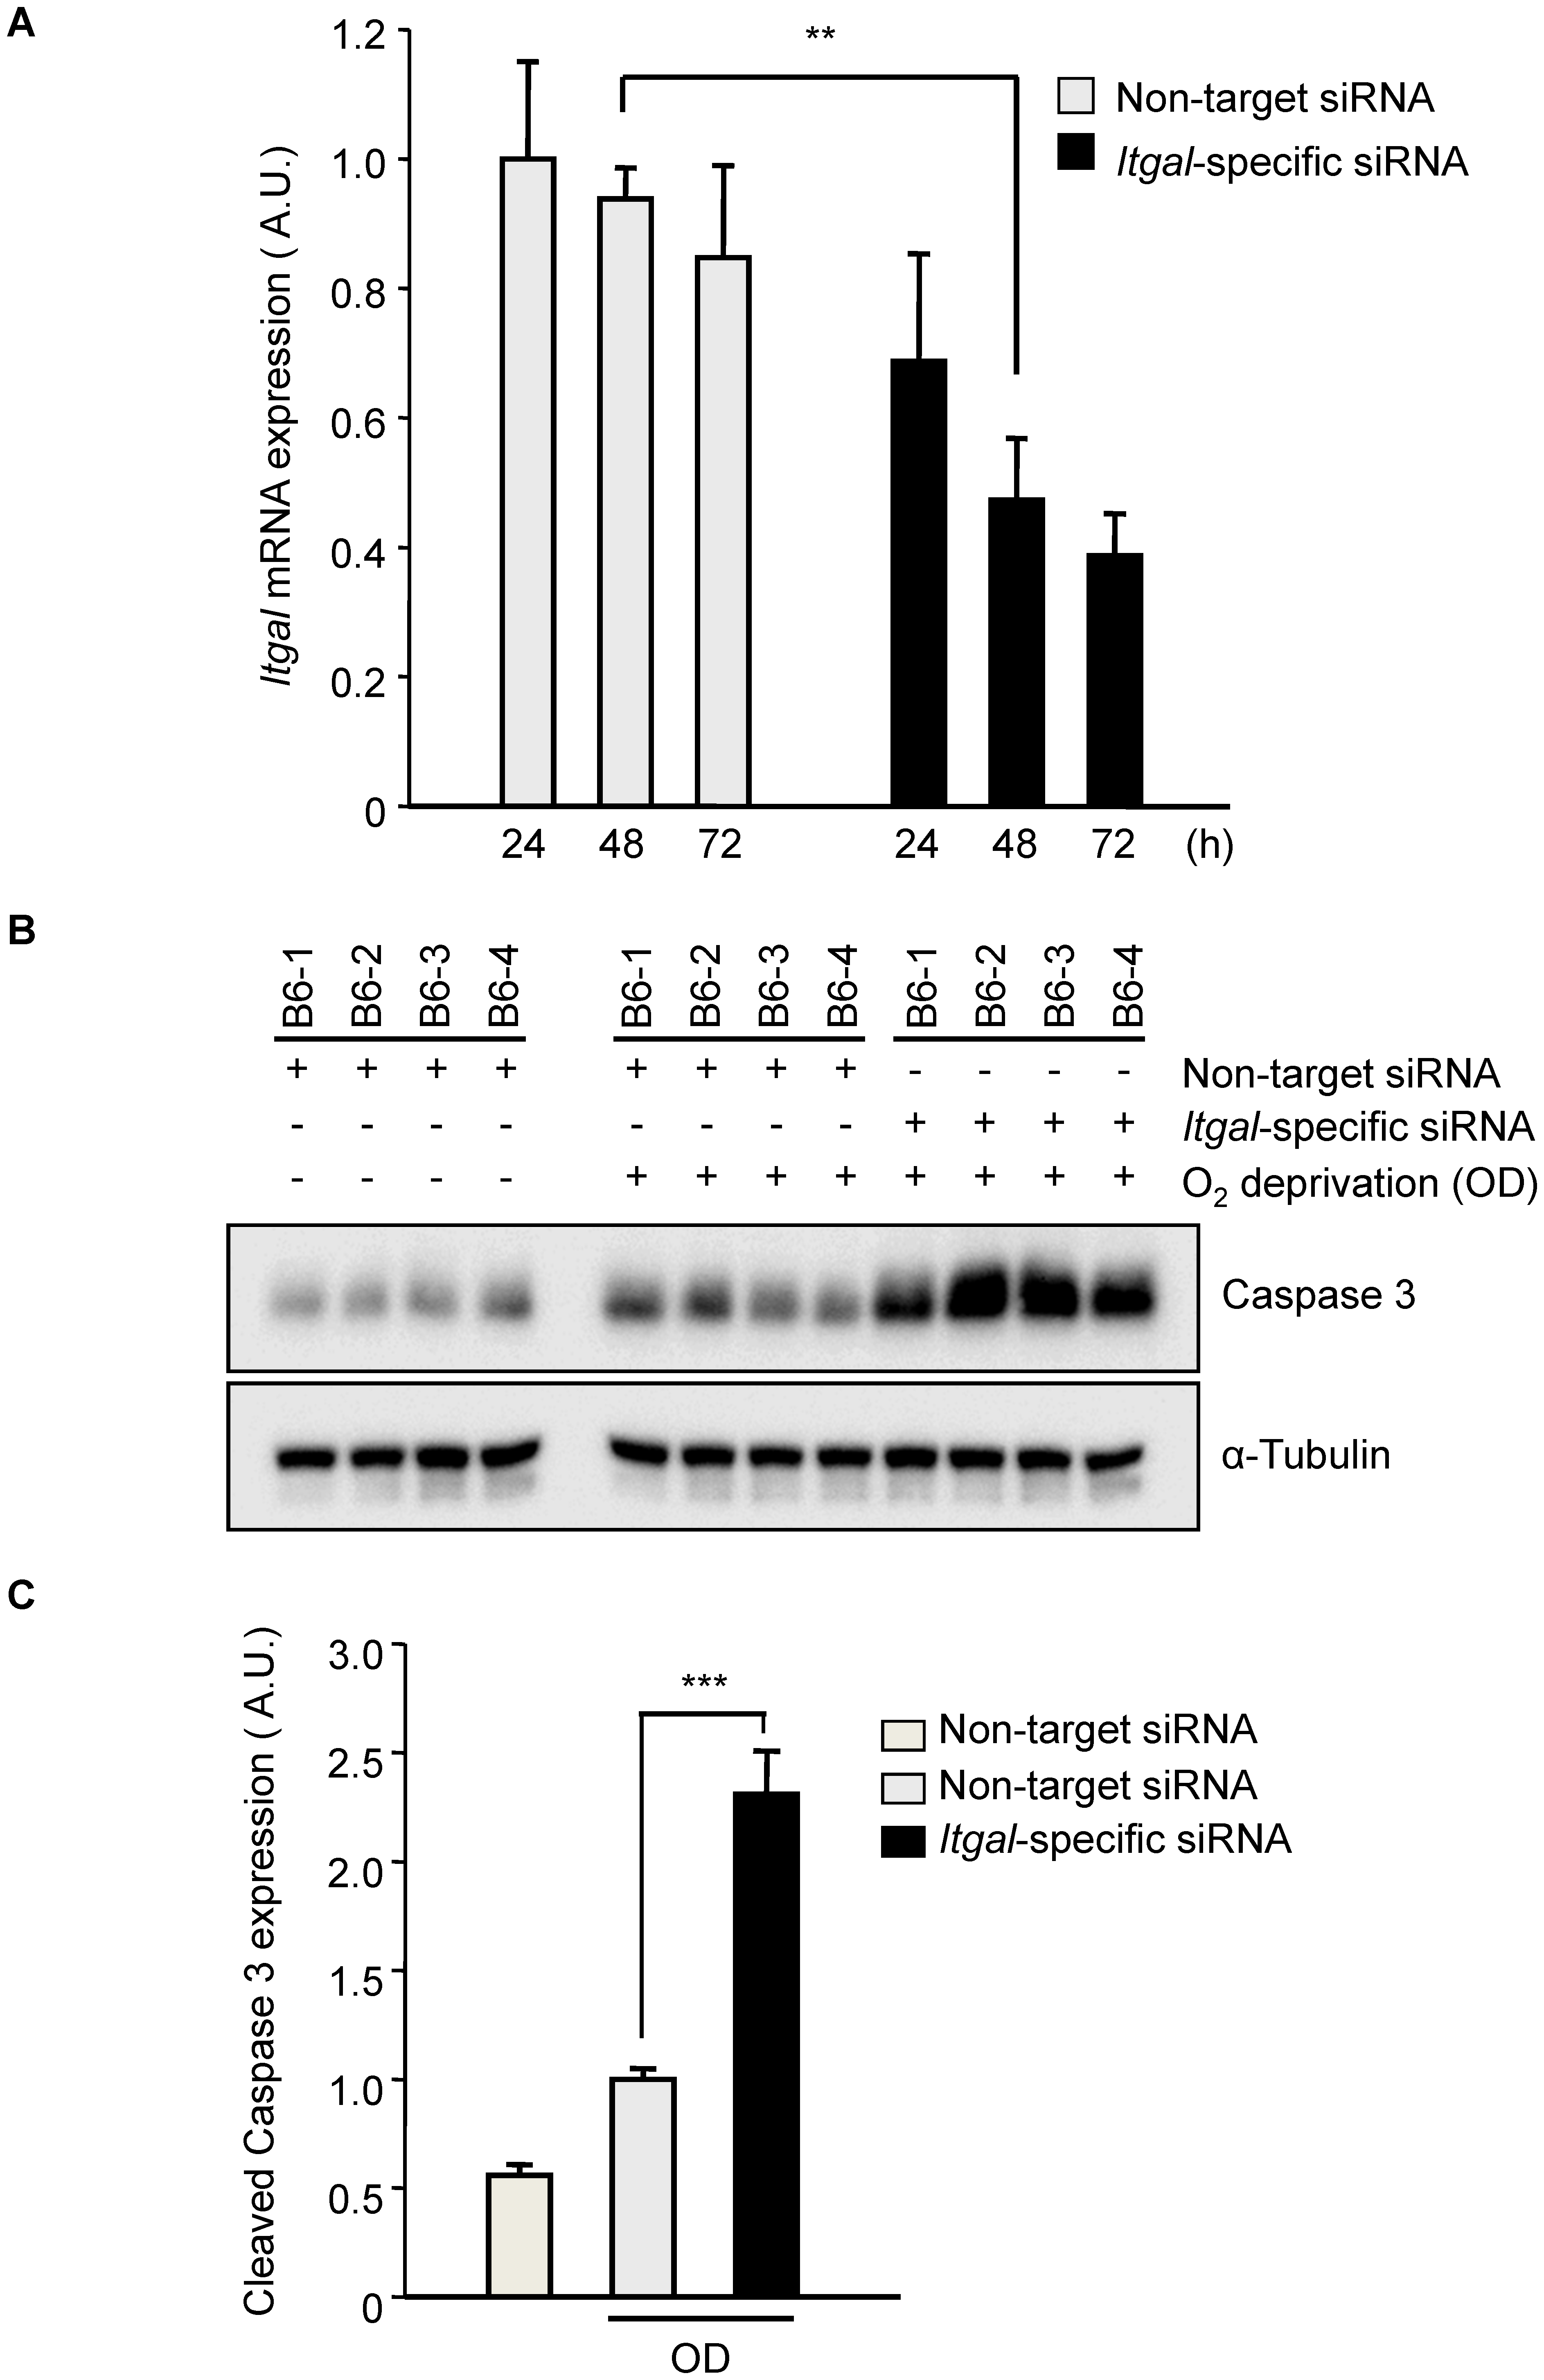 Oxygen deprivation increases cleaved Caspase 3 in an <i>ex vivo</i> brain slice stroke model.